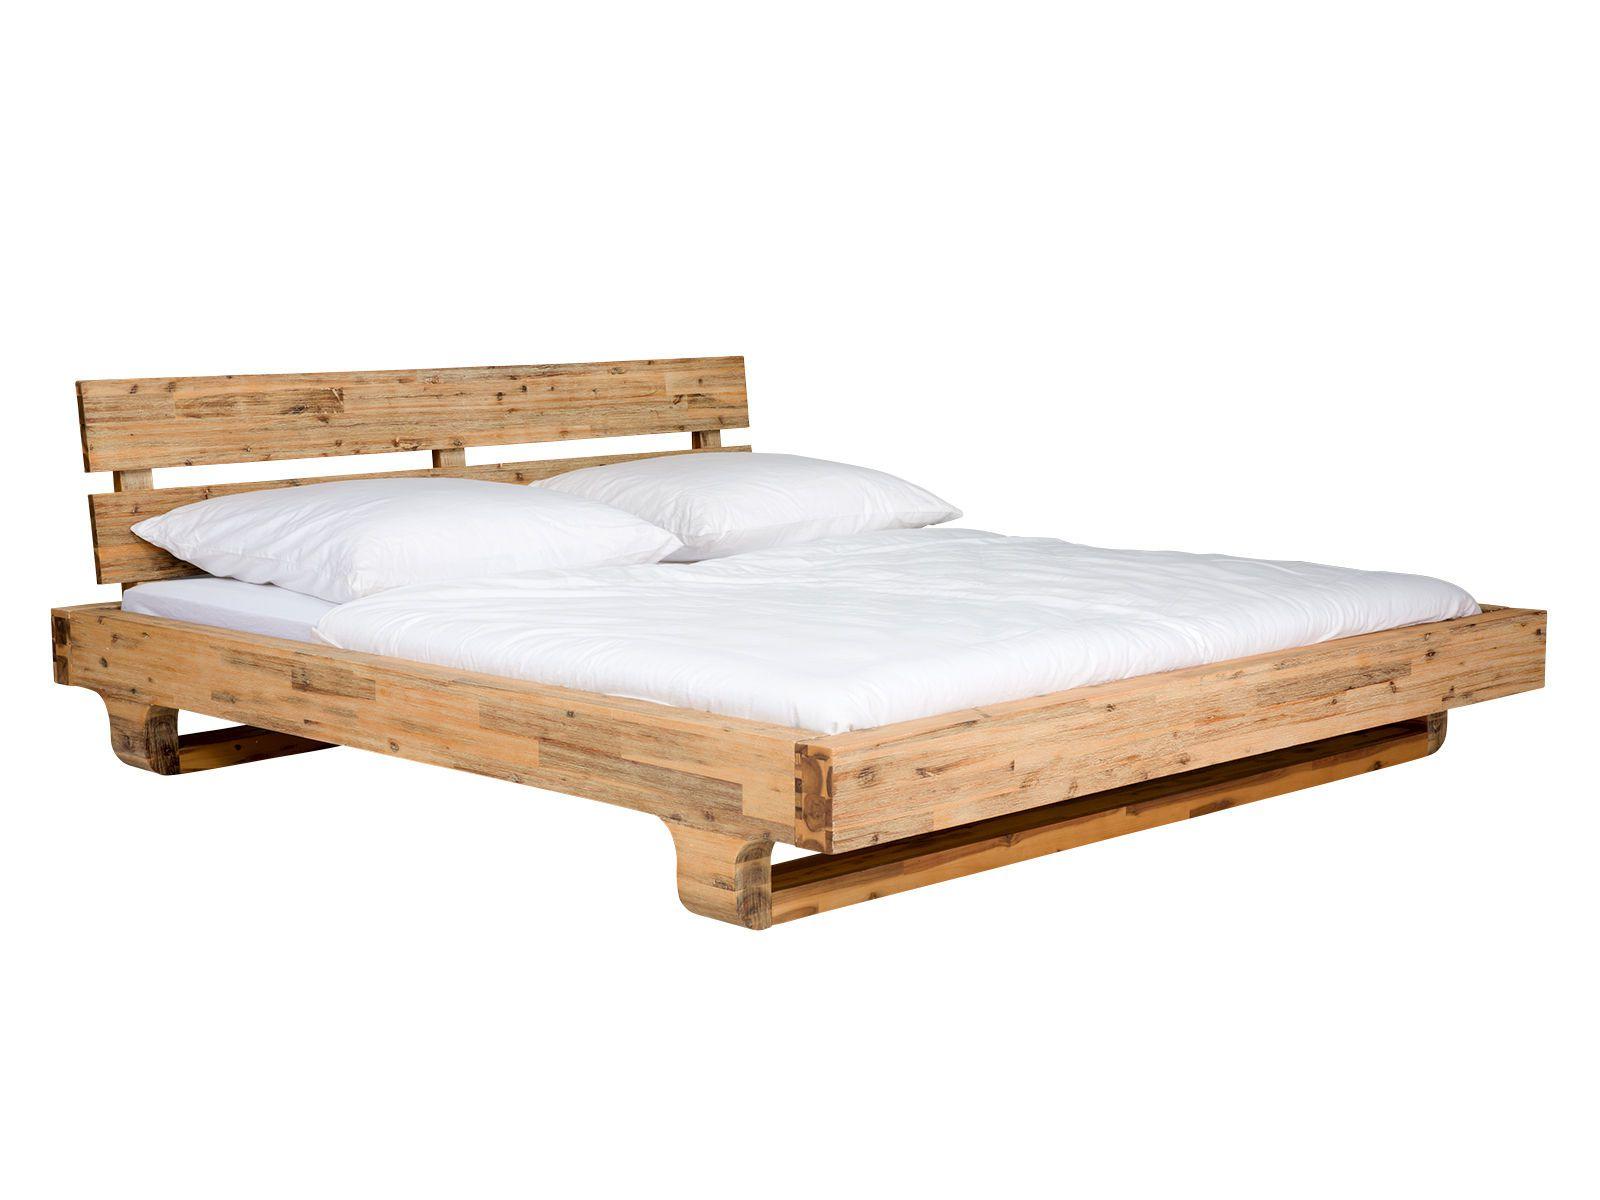 Full Size of Bett Massivholz Holzbett Madras Massivum 160x200 Mit Lattenrost Und Matratze Betten Landhausstil Dänisches Bettenlager Badezimmer Bette Badewannen Kaufen Bett Bett Massivholz